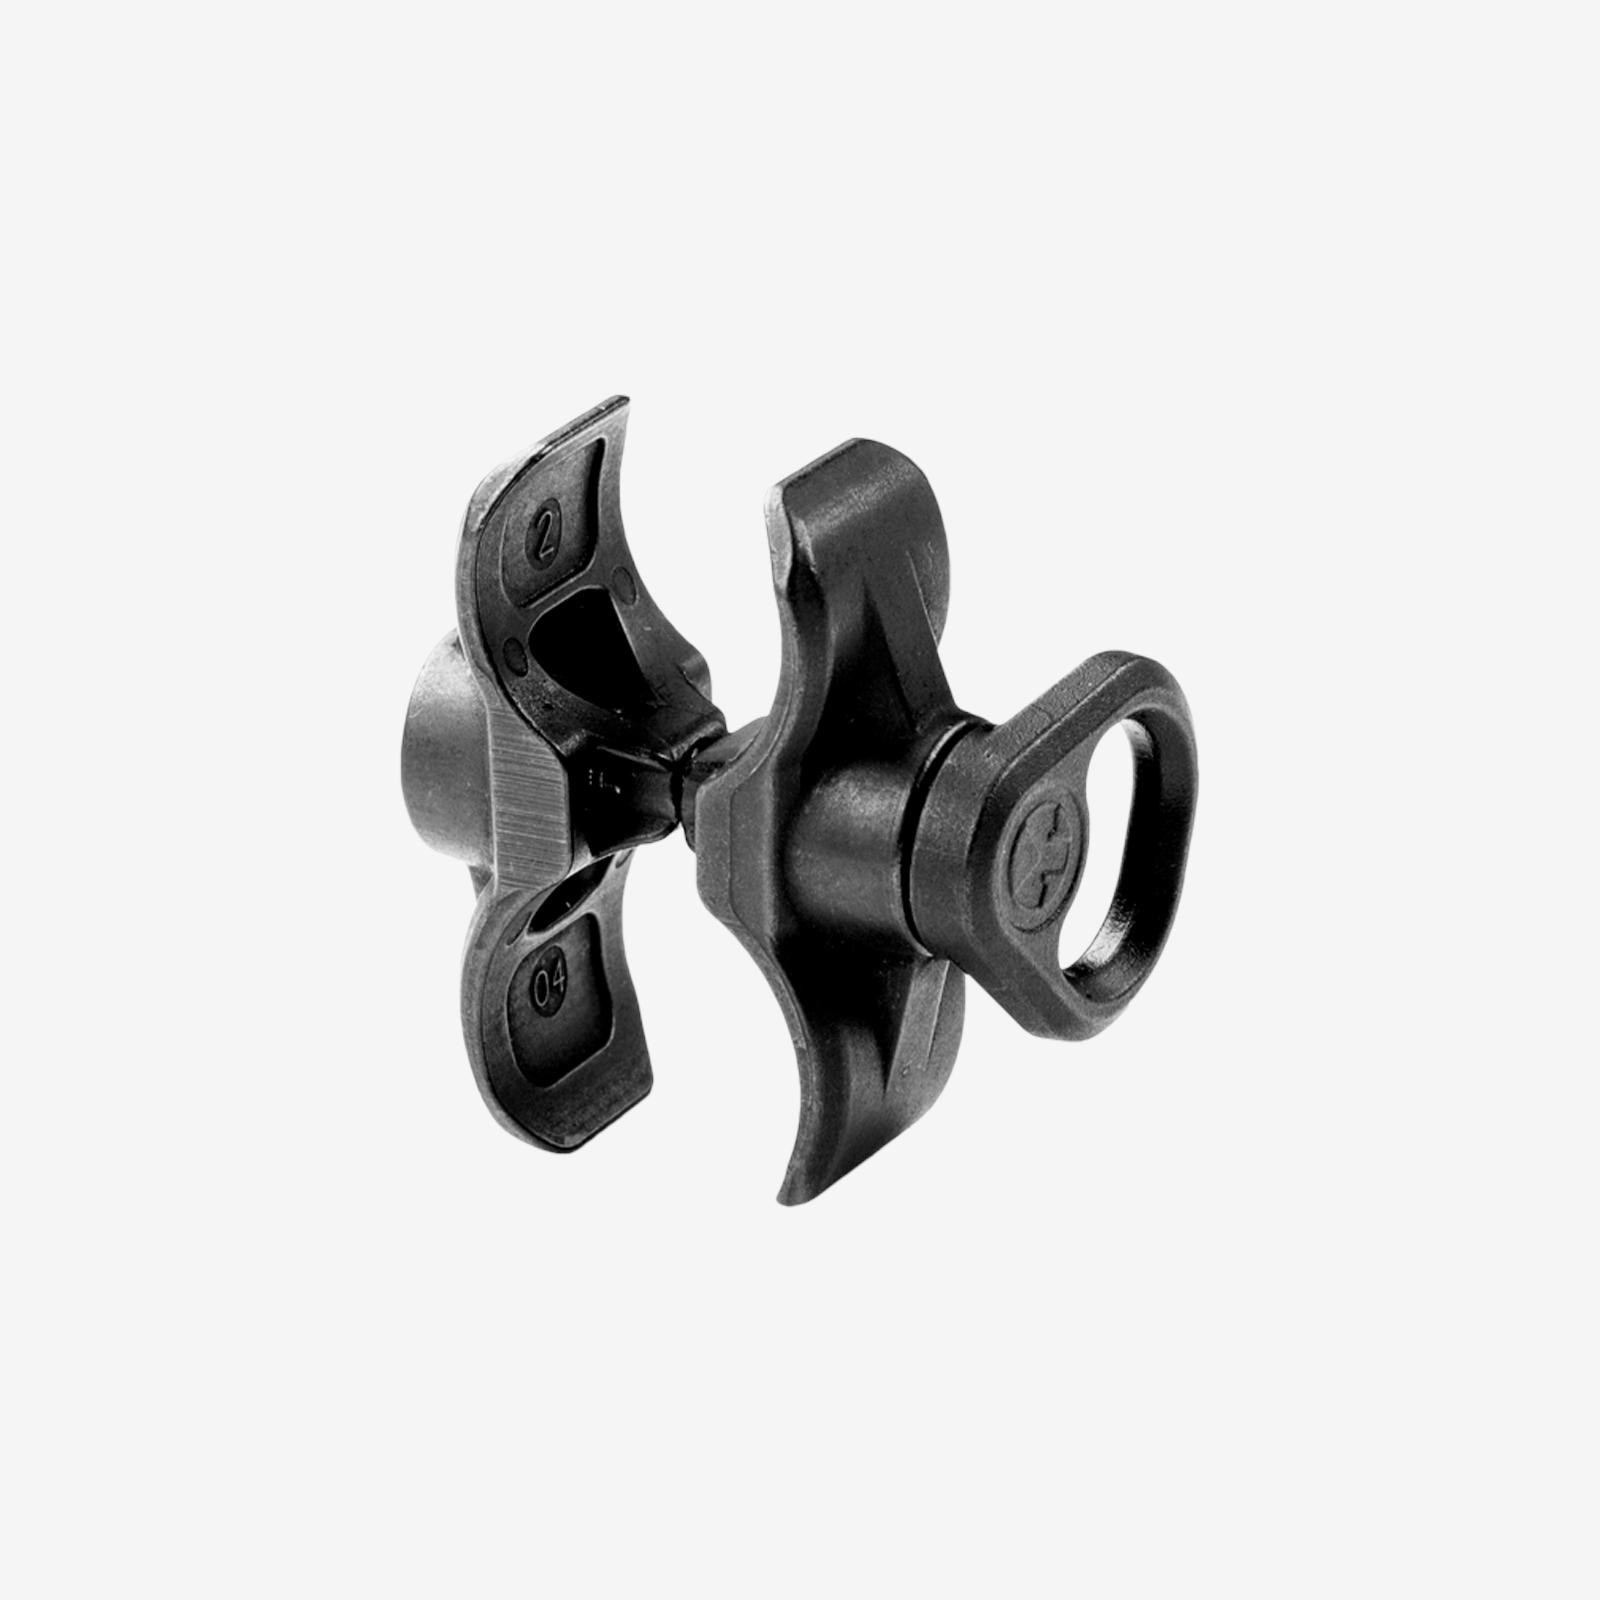 Стяжка ствола и магазина с антабкой ForwardSlingMount-Mossberg®500/590